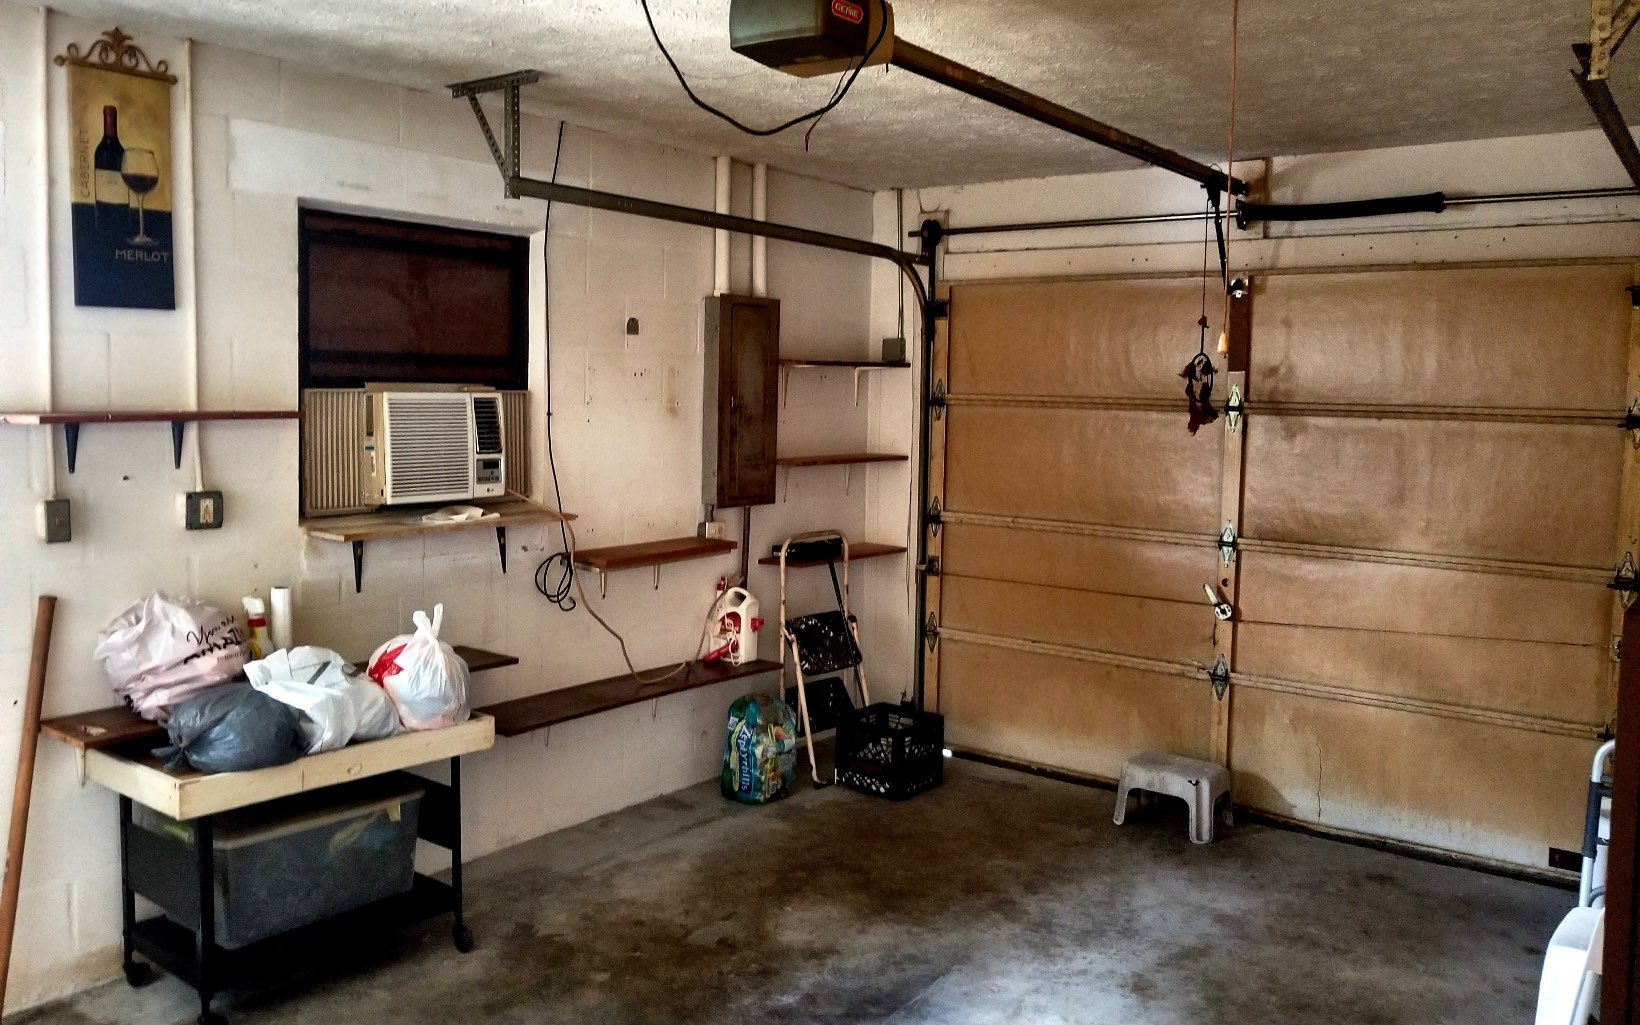 237 Washington Blvd, Lake Placid, FL 33852